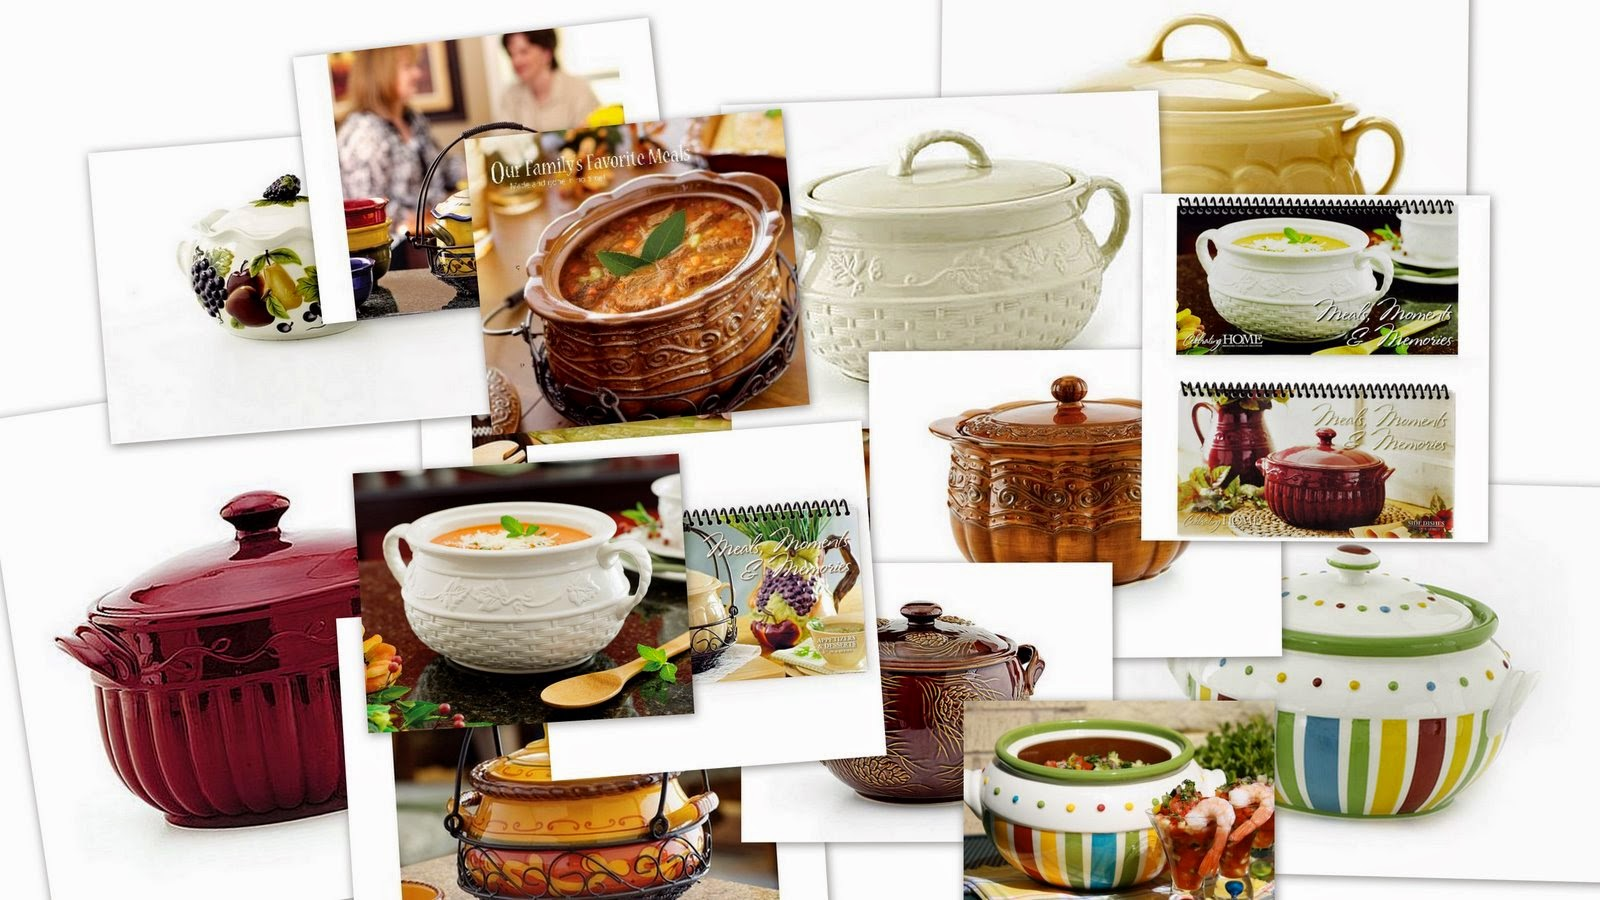 celebrating home coupon code 2012